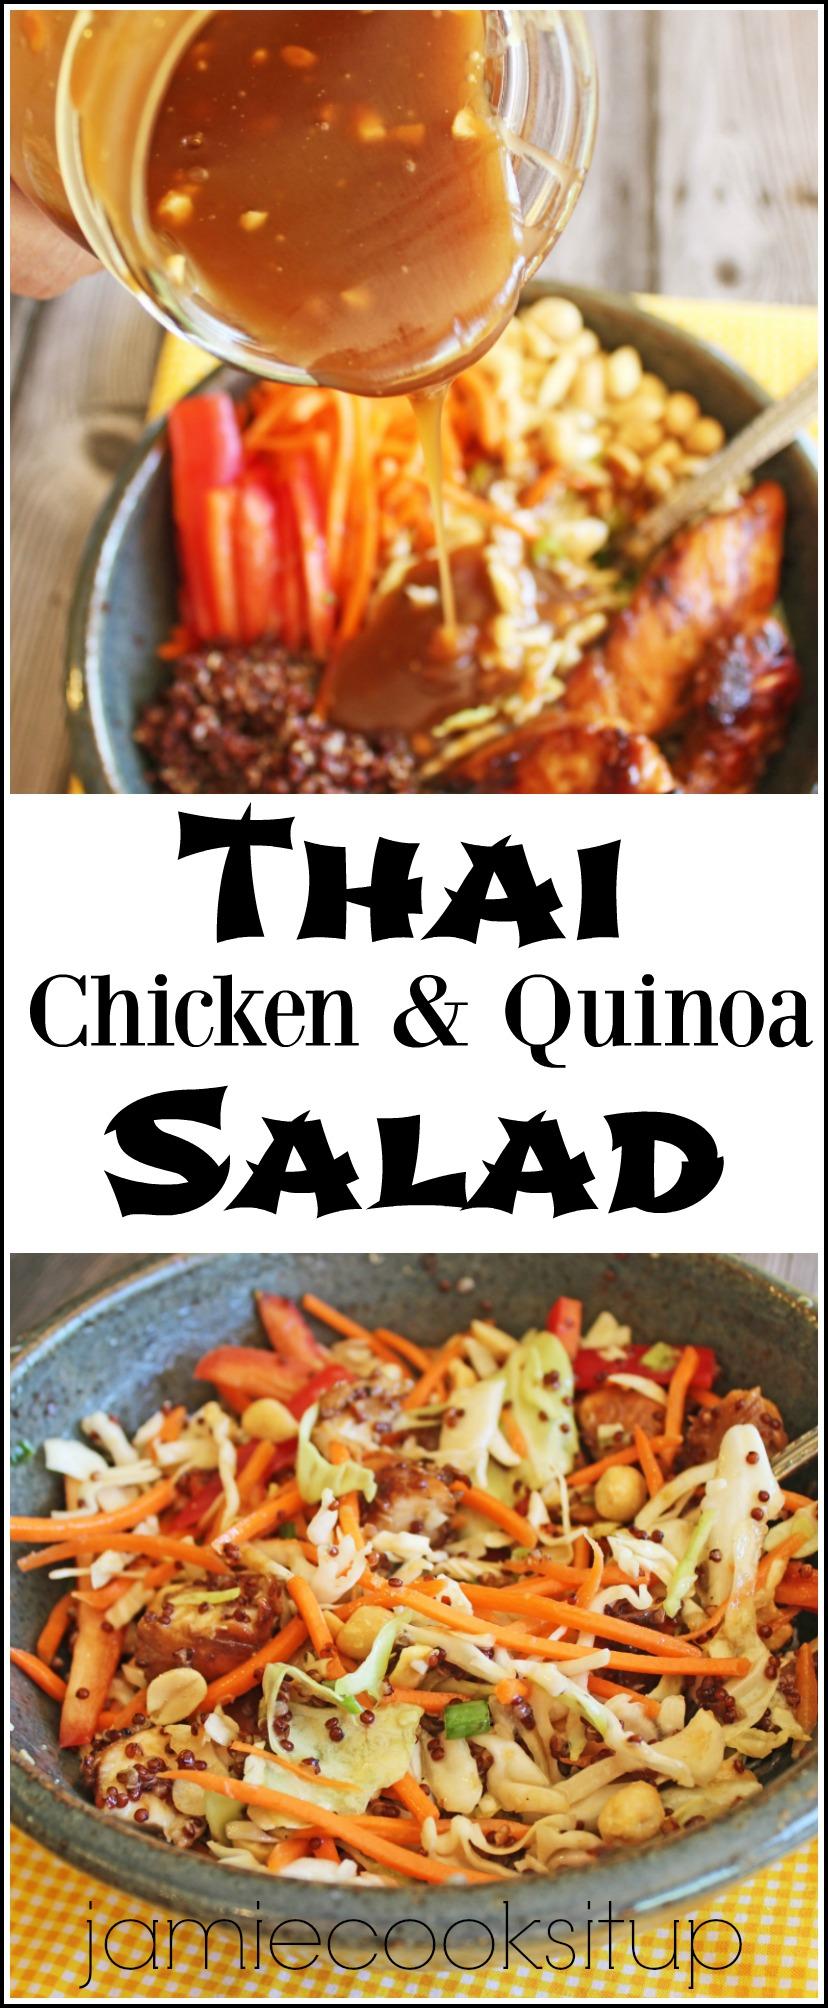 thai-chicken-and-quinoa-salad